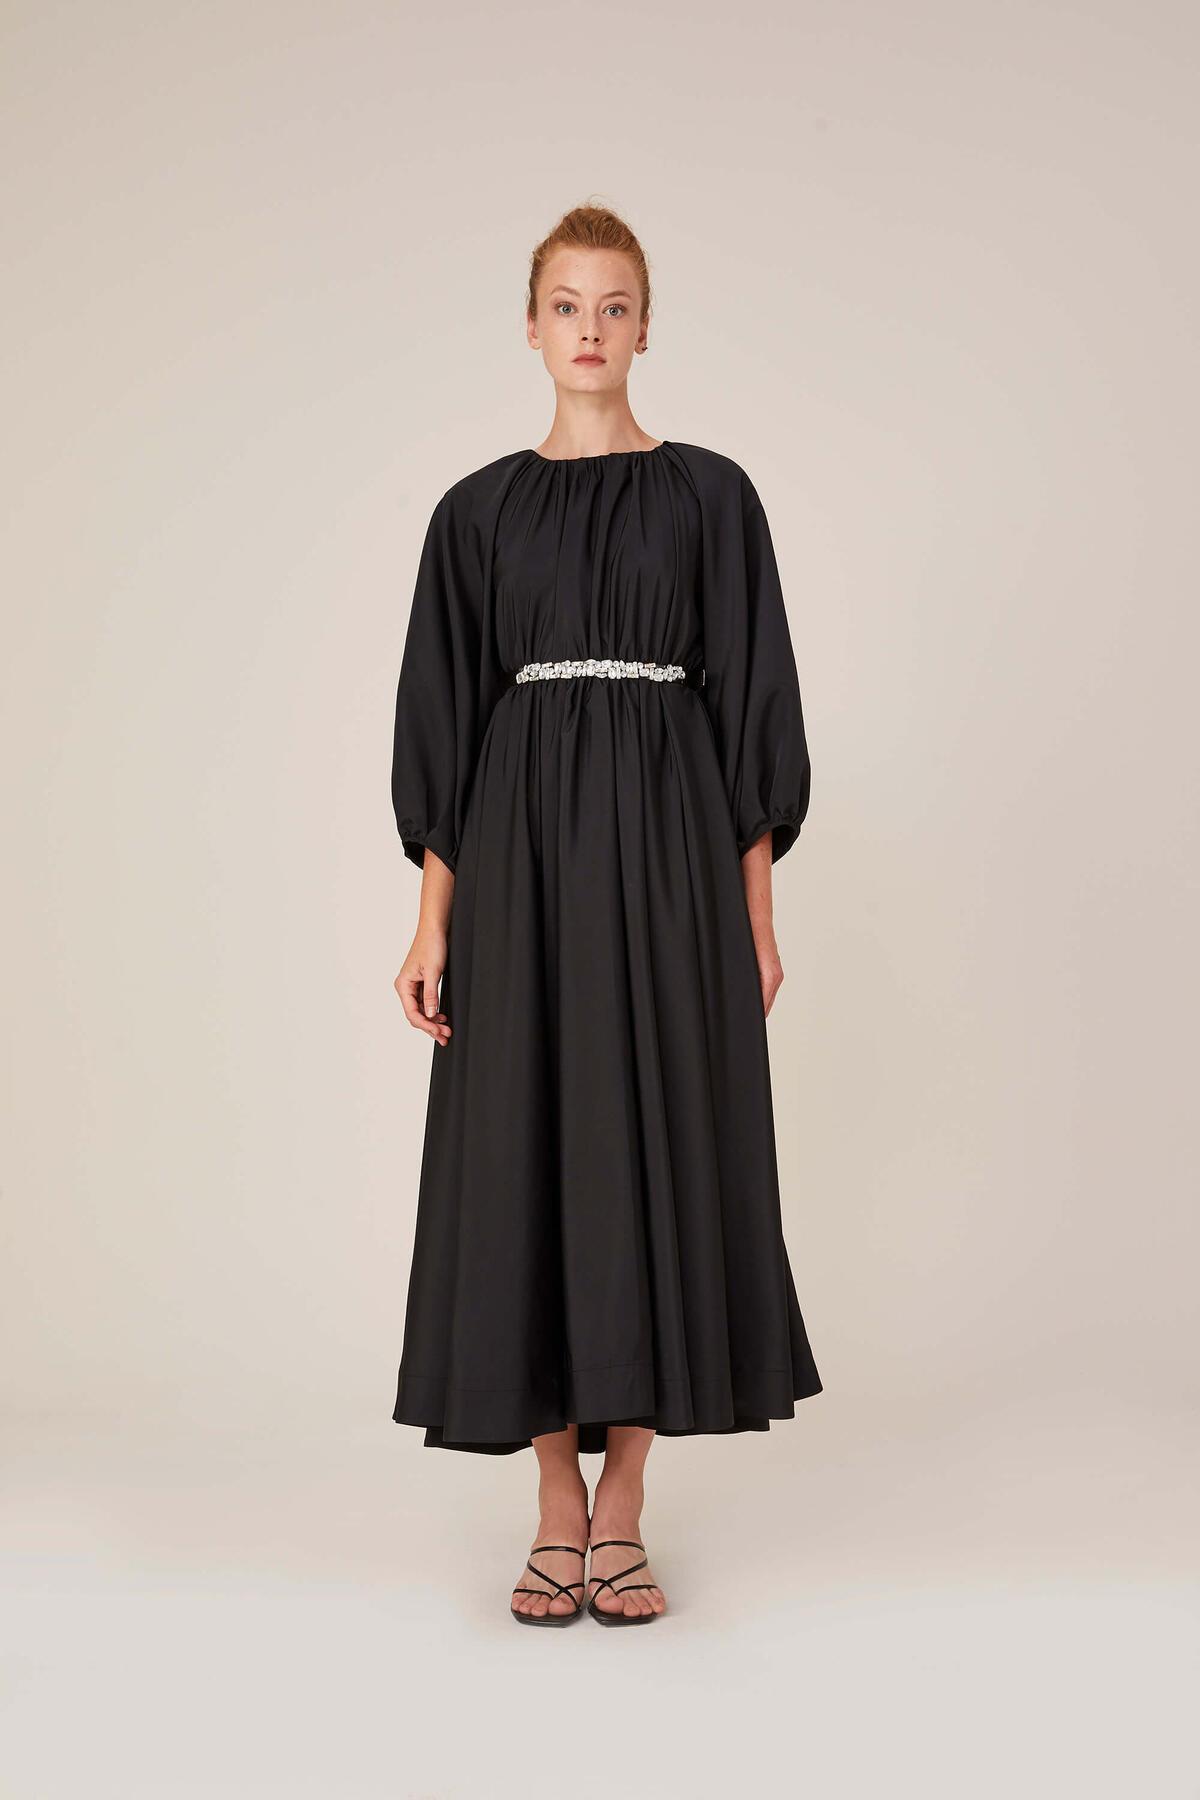 SHINY STONE BELT DRESS